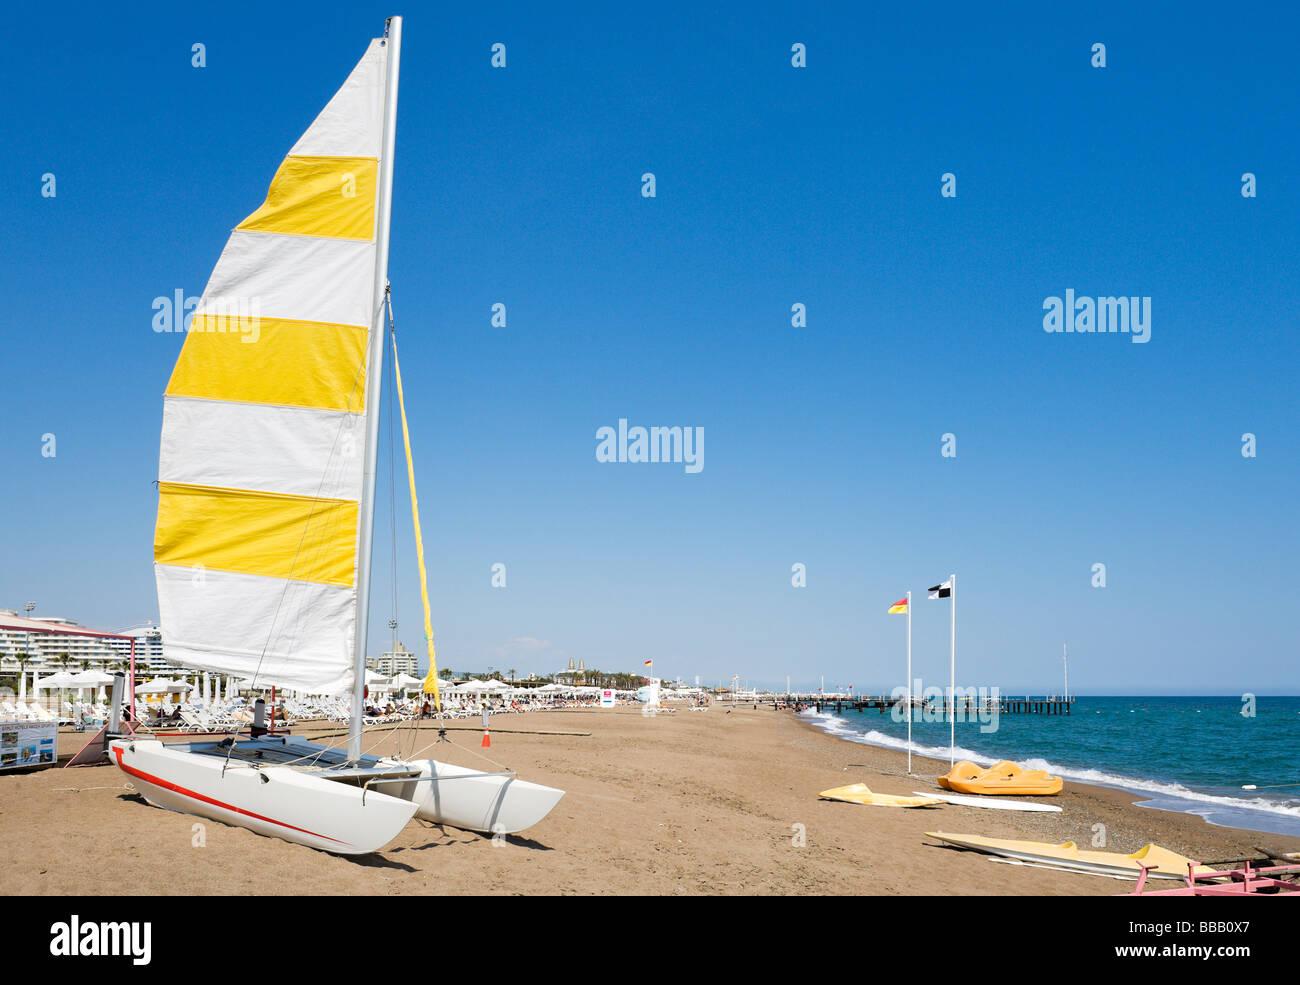 Watersports outside the Barut Lara Hotel, Lara Beach, near Antalya, Mediterranean Coast, Turkey - Stock Image